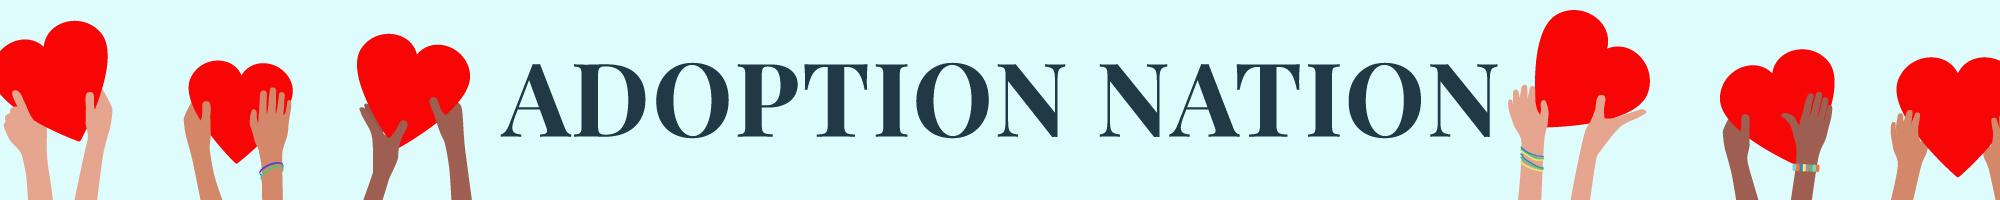 adoption nation